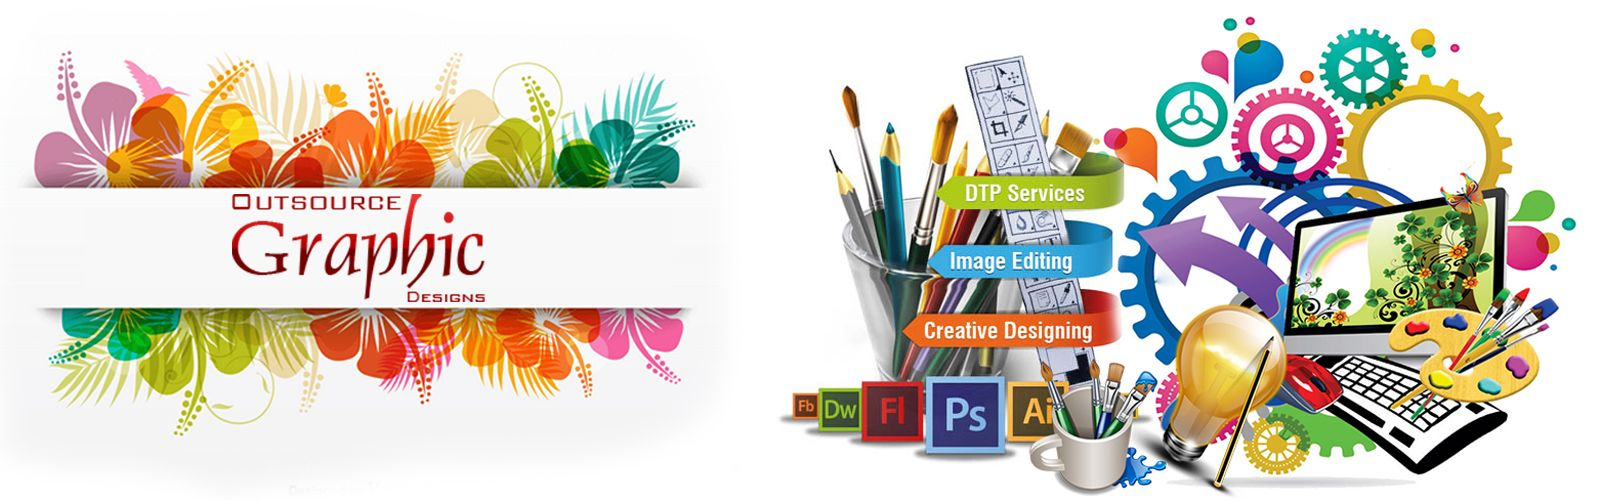 Choosing Graphic Design Firms Graphic Design Course Graphic Design Firms Graphic Design Company